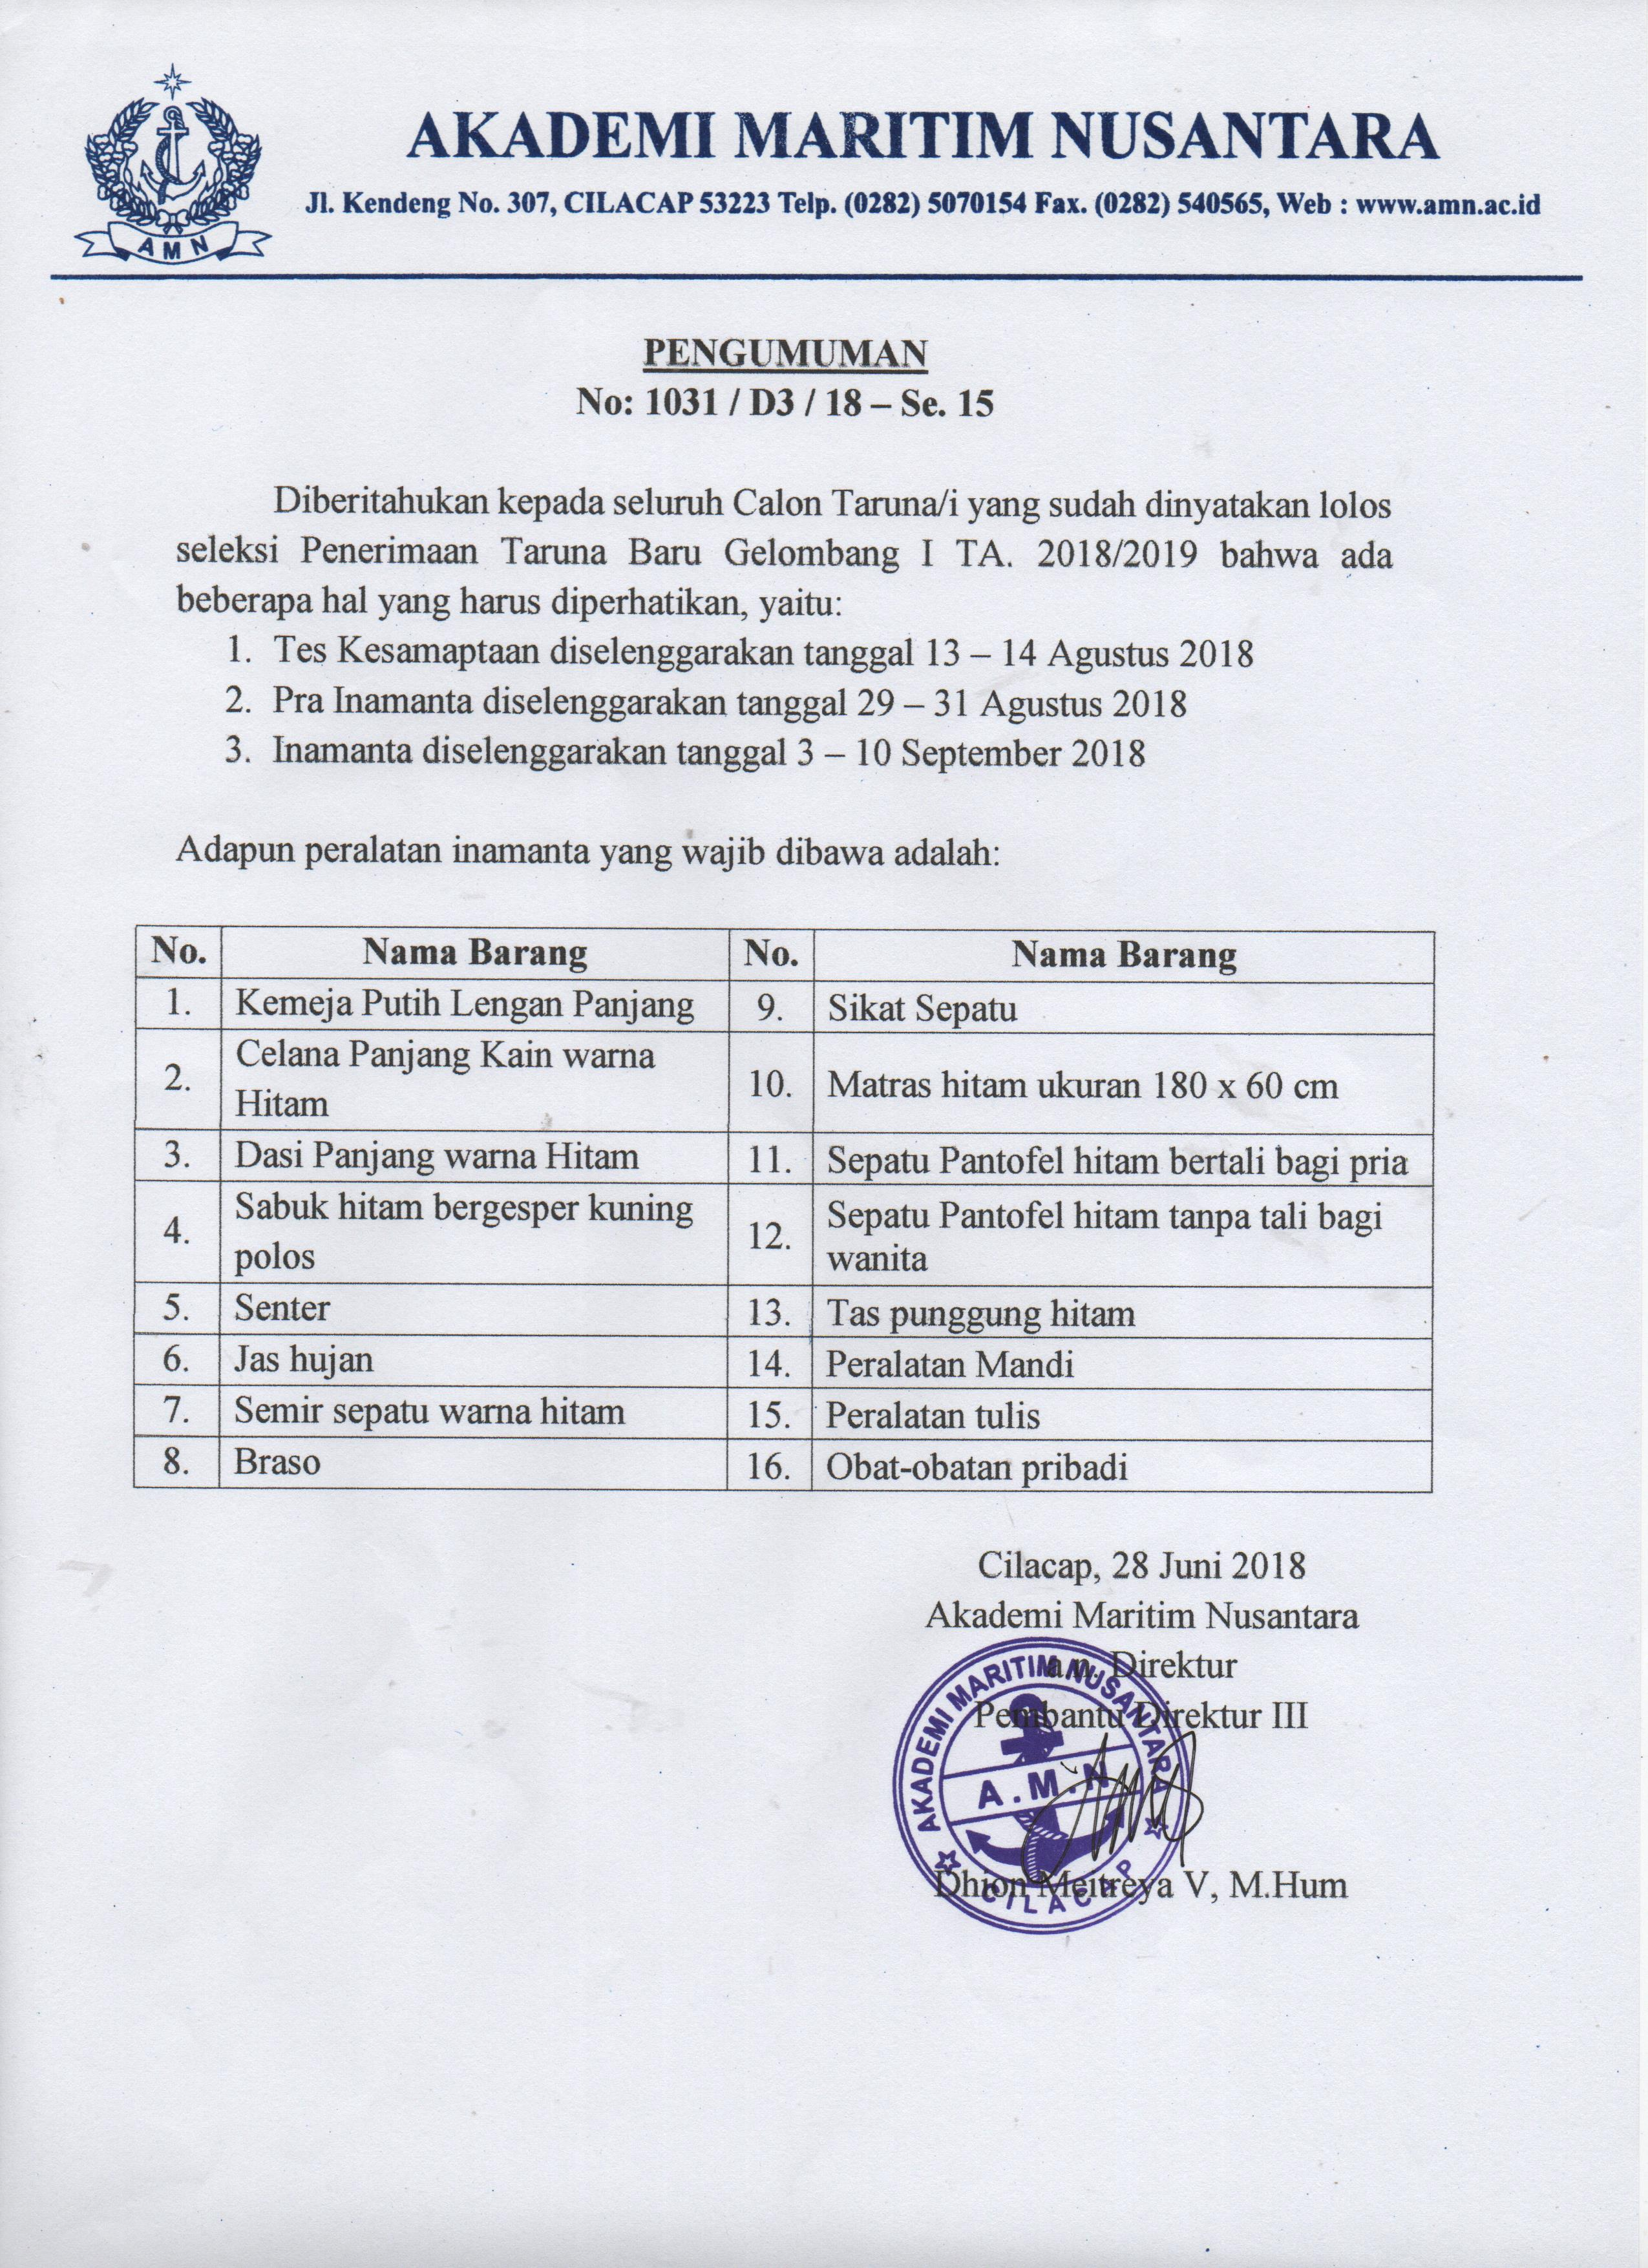 Peralatan Inamanta TA. 2018/2019 WAJIB